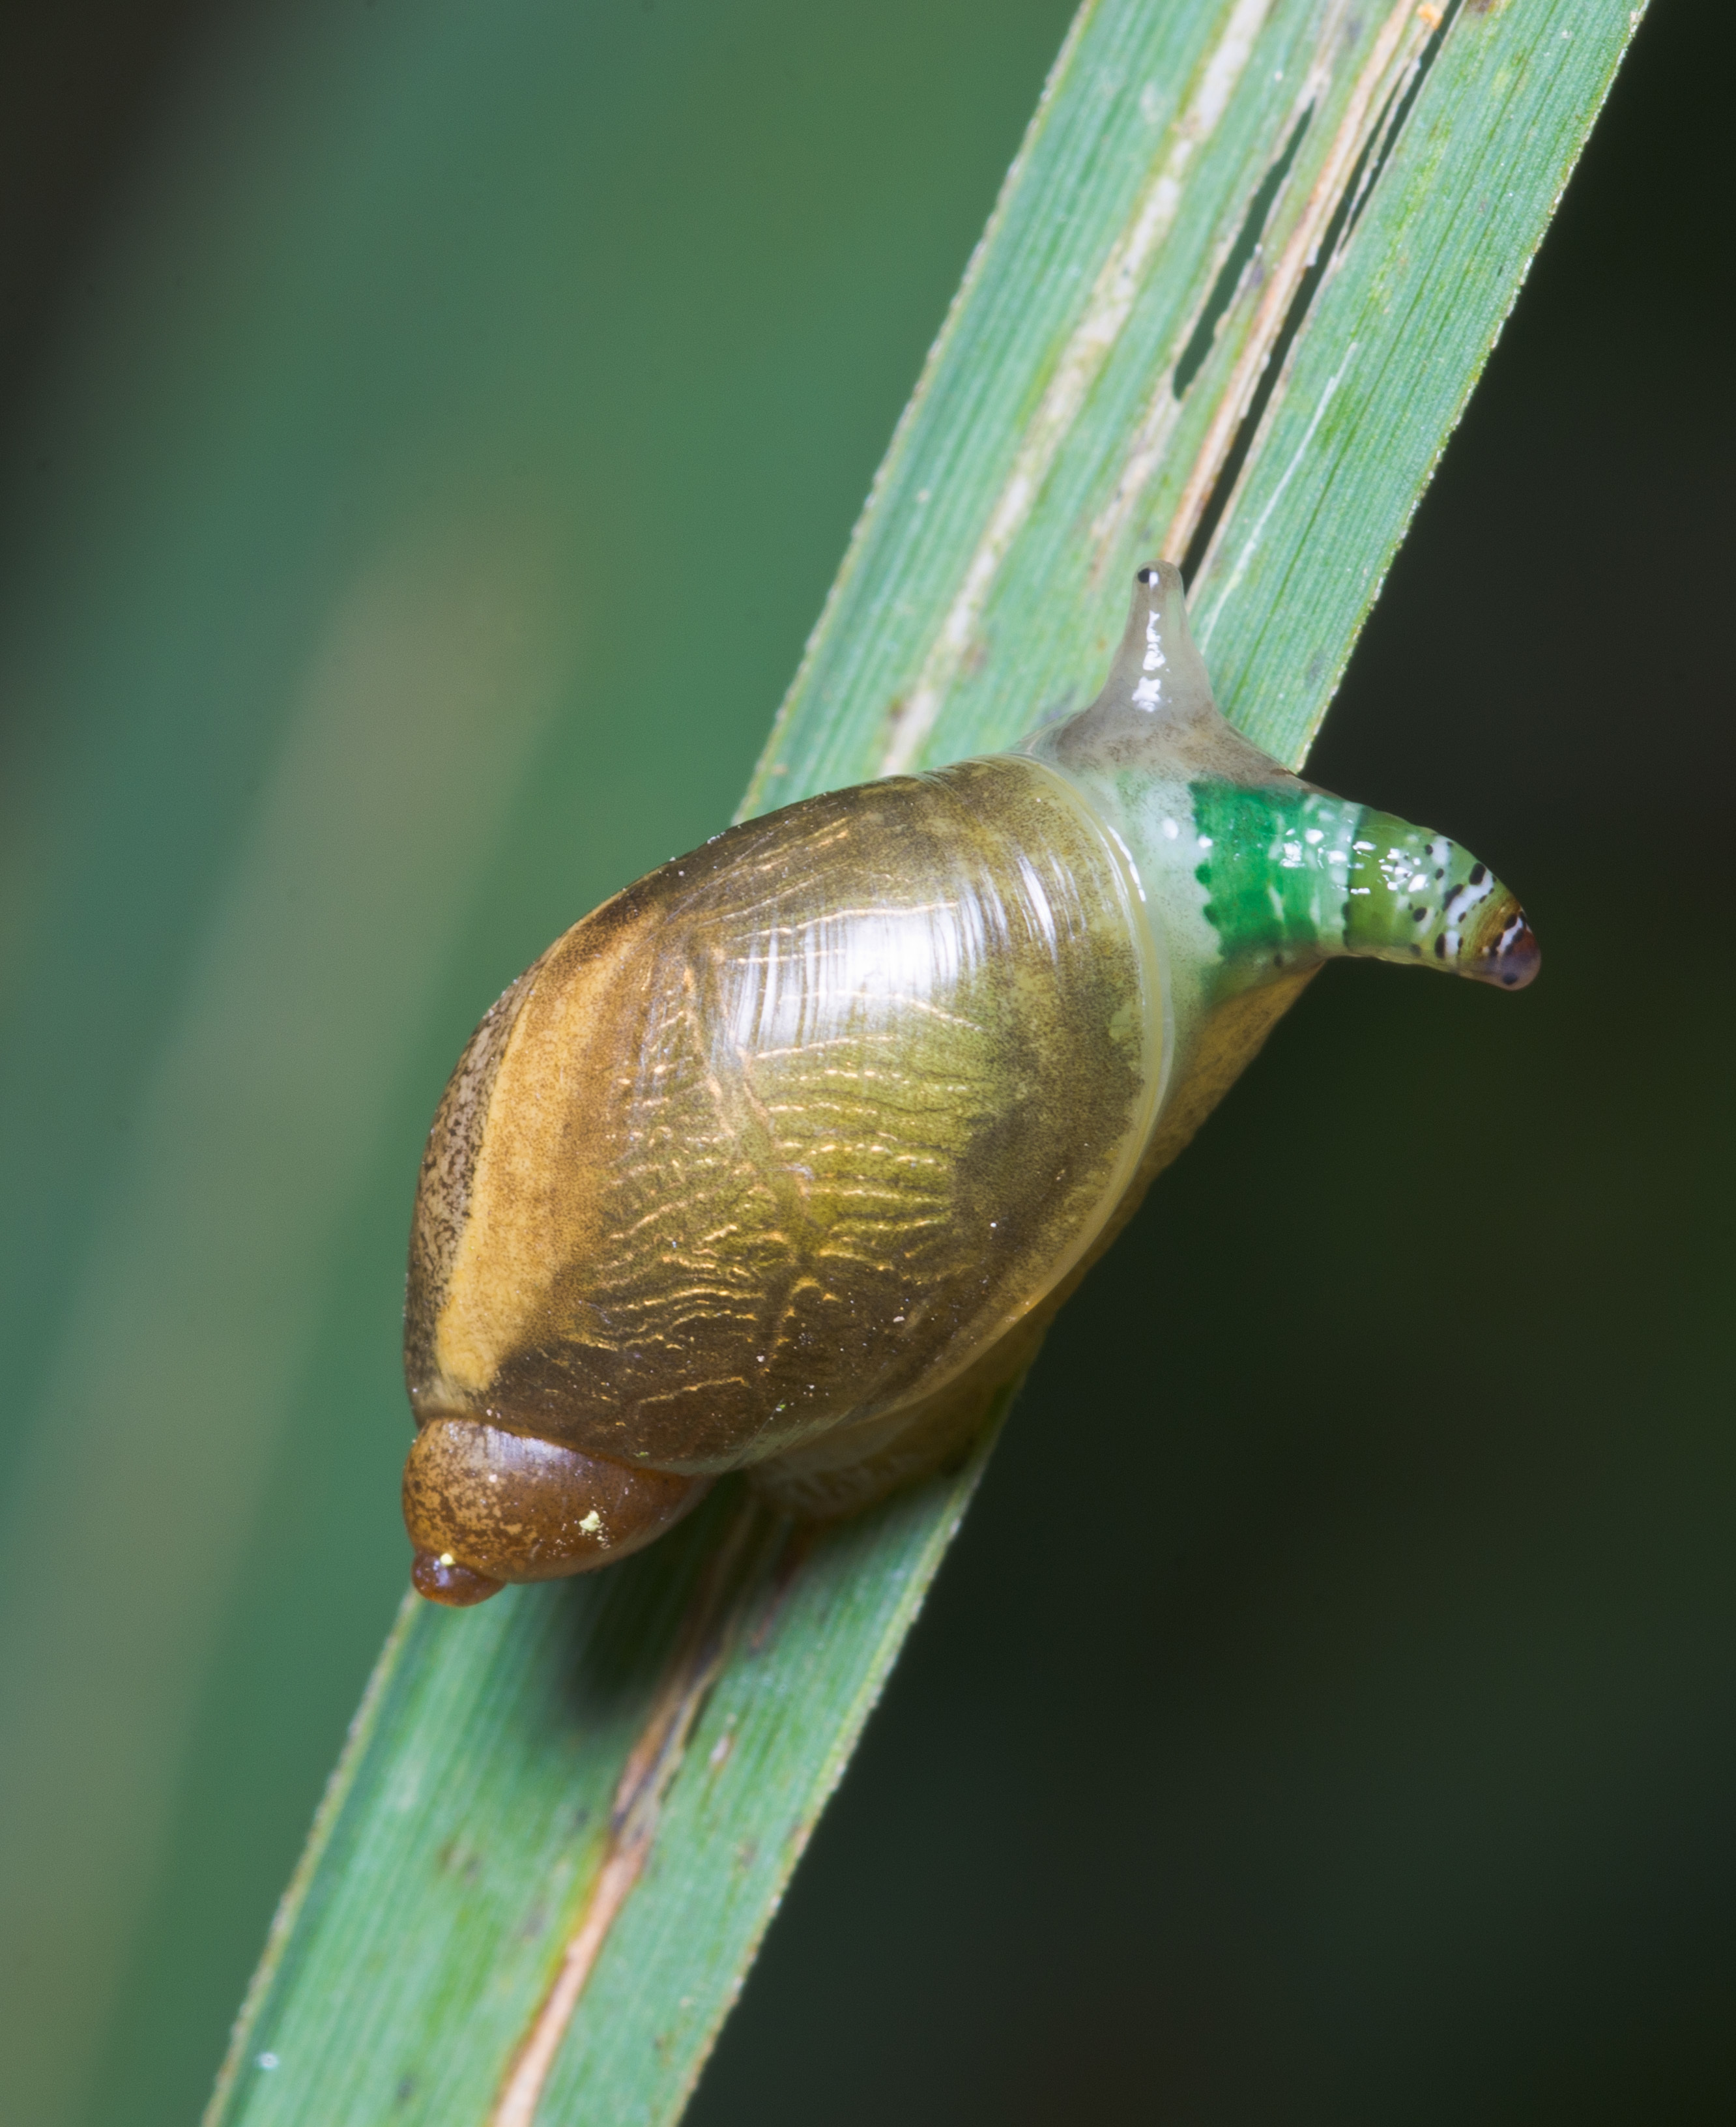 Image of green-banded broodsac